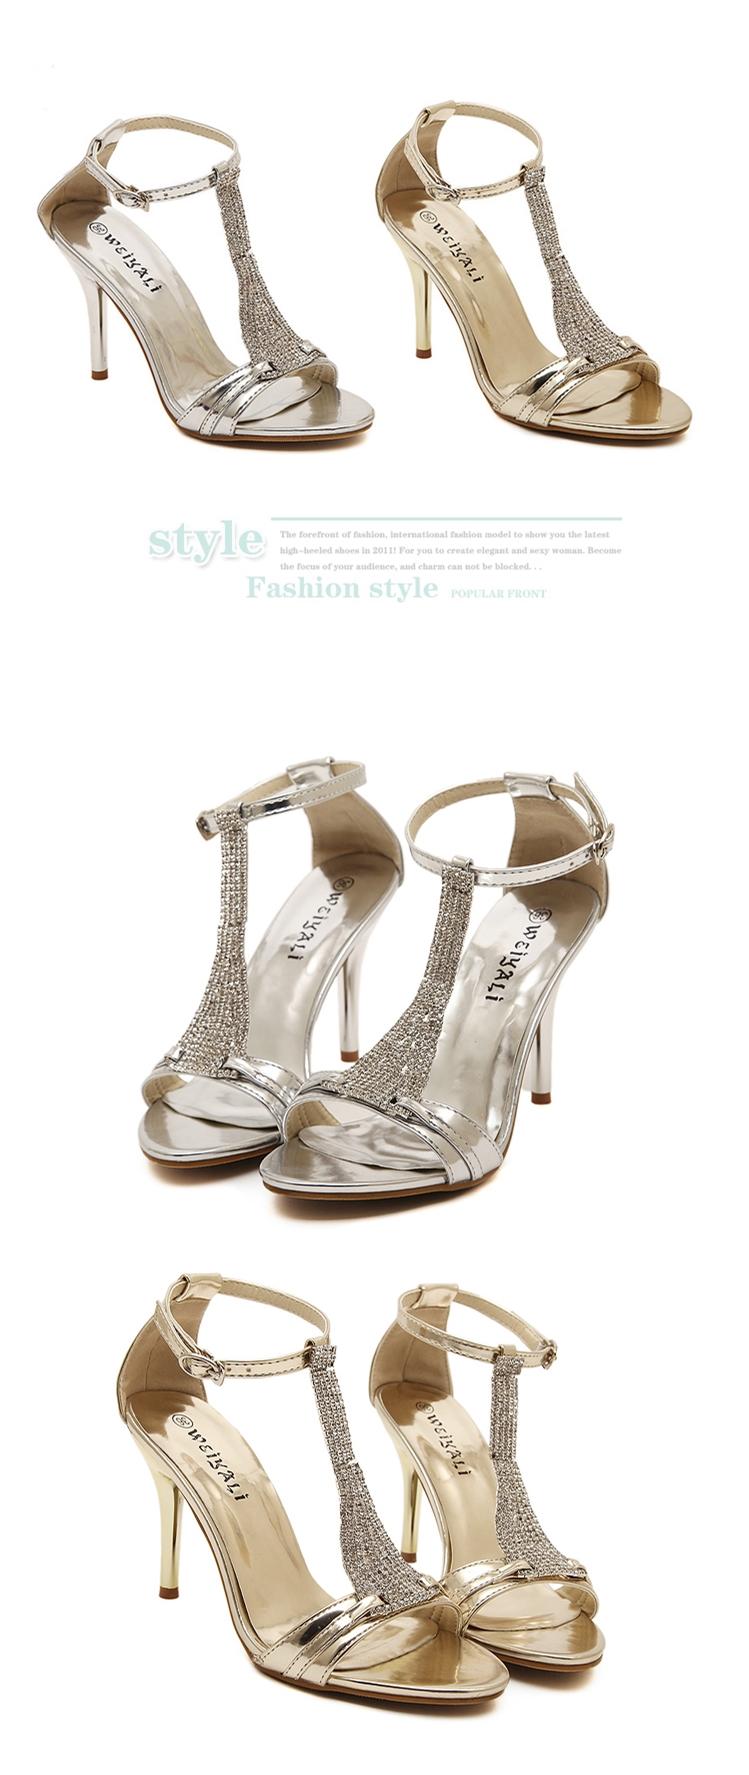 7c9866a2d023 New Novelty Pumps For Women Sandals on Platform Small size High Heel Shoes  Horsehair Big Eye Shoes Exclusive sale Online StoreUSD 90.00 piece